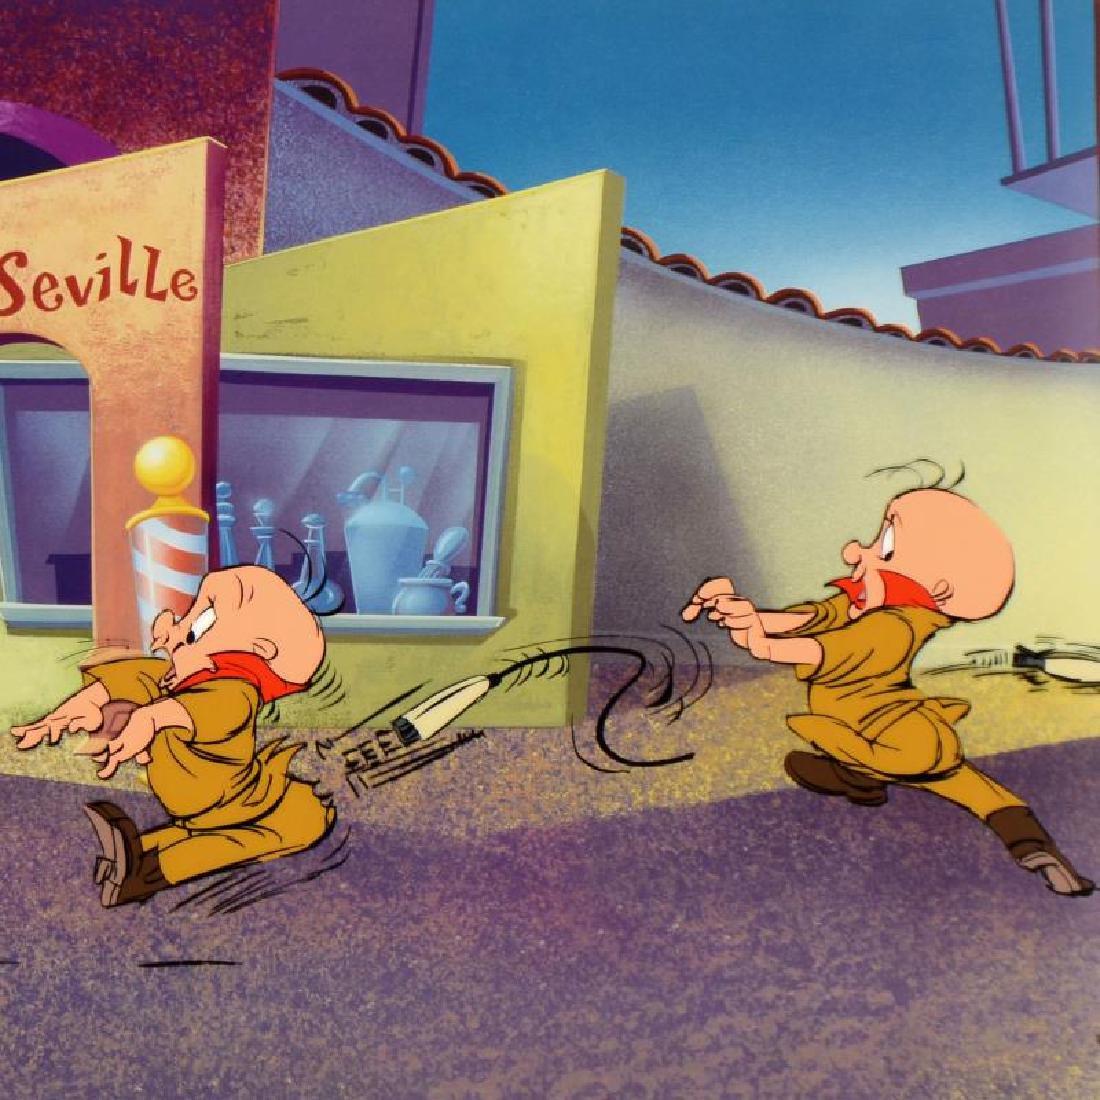 Rabbit Of Seville by Chuck Jones (1912-2002) - 2